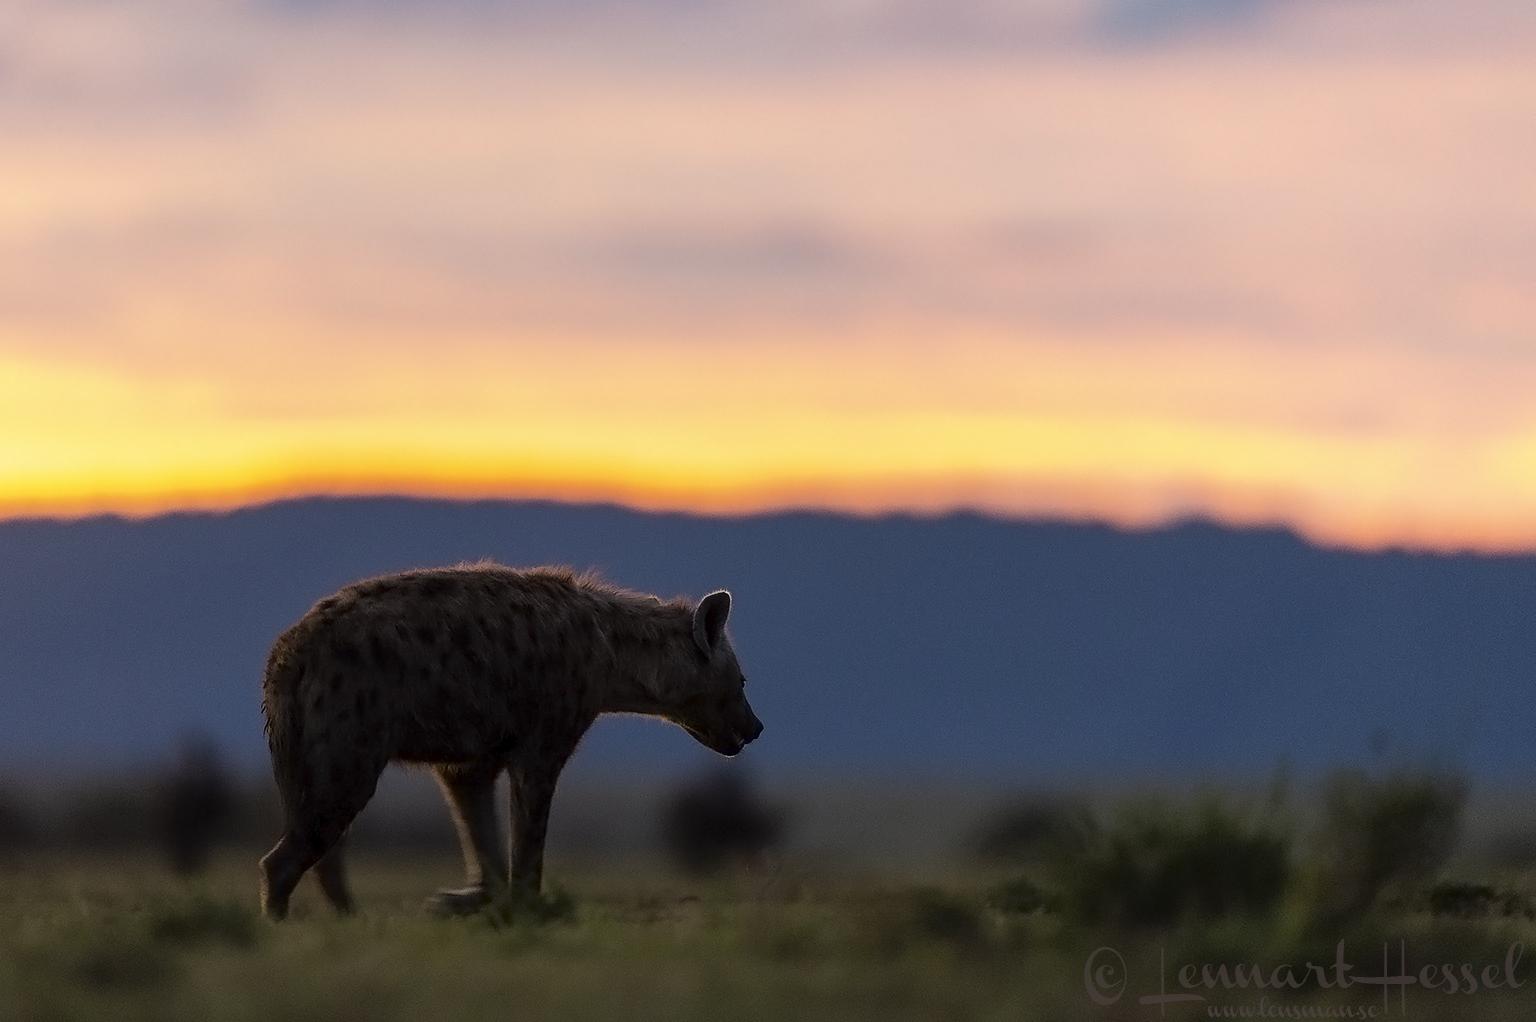 Spotted hyena at sunset Maasai Mara National Reserve